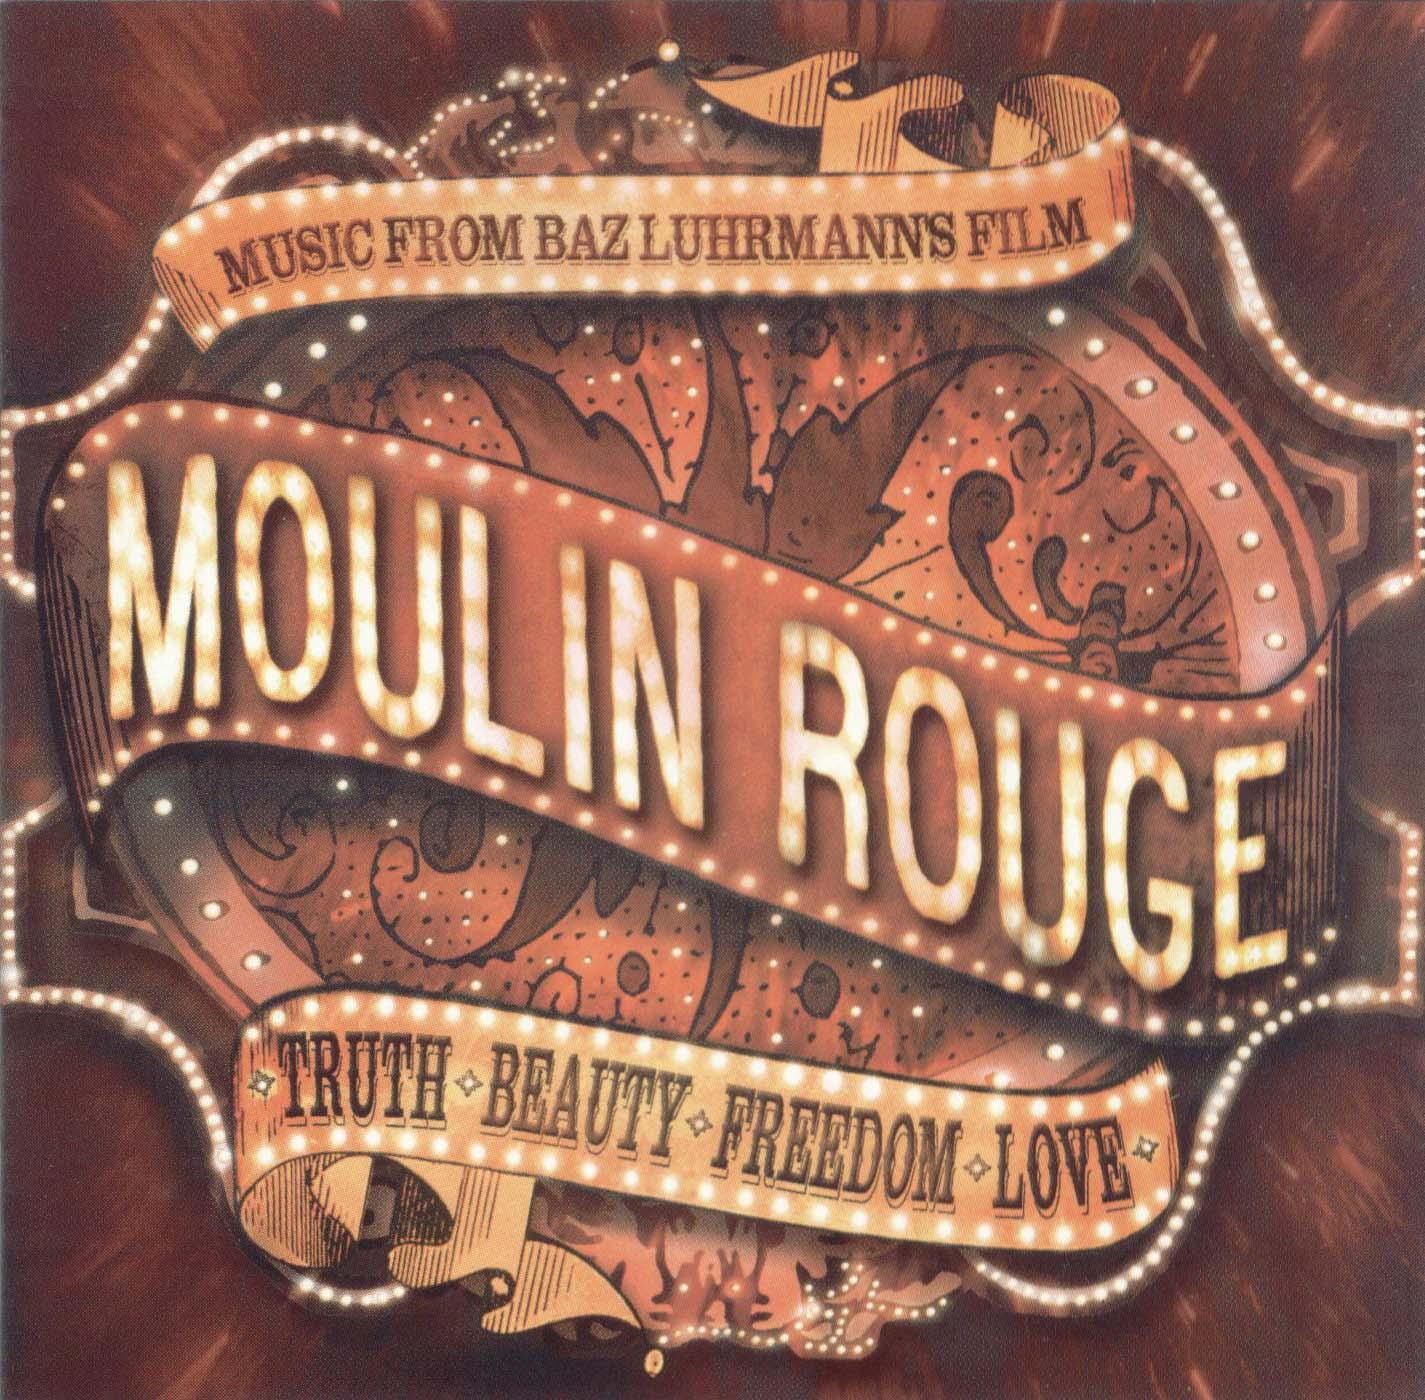 http://3.bp.blogspot.com/-7epch4LlKxQ/UGmYPIyvCuI/AAAAAAAABfM/PFZd4K80R0E/s1600/Moulin+Rouge.jpg